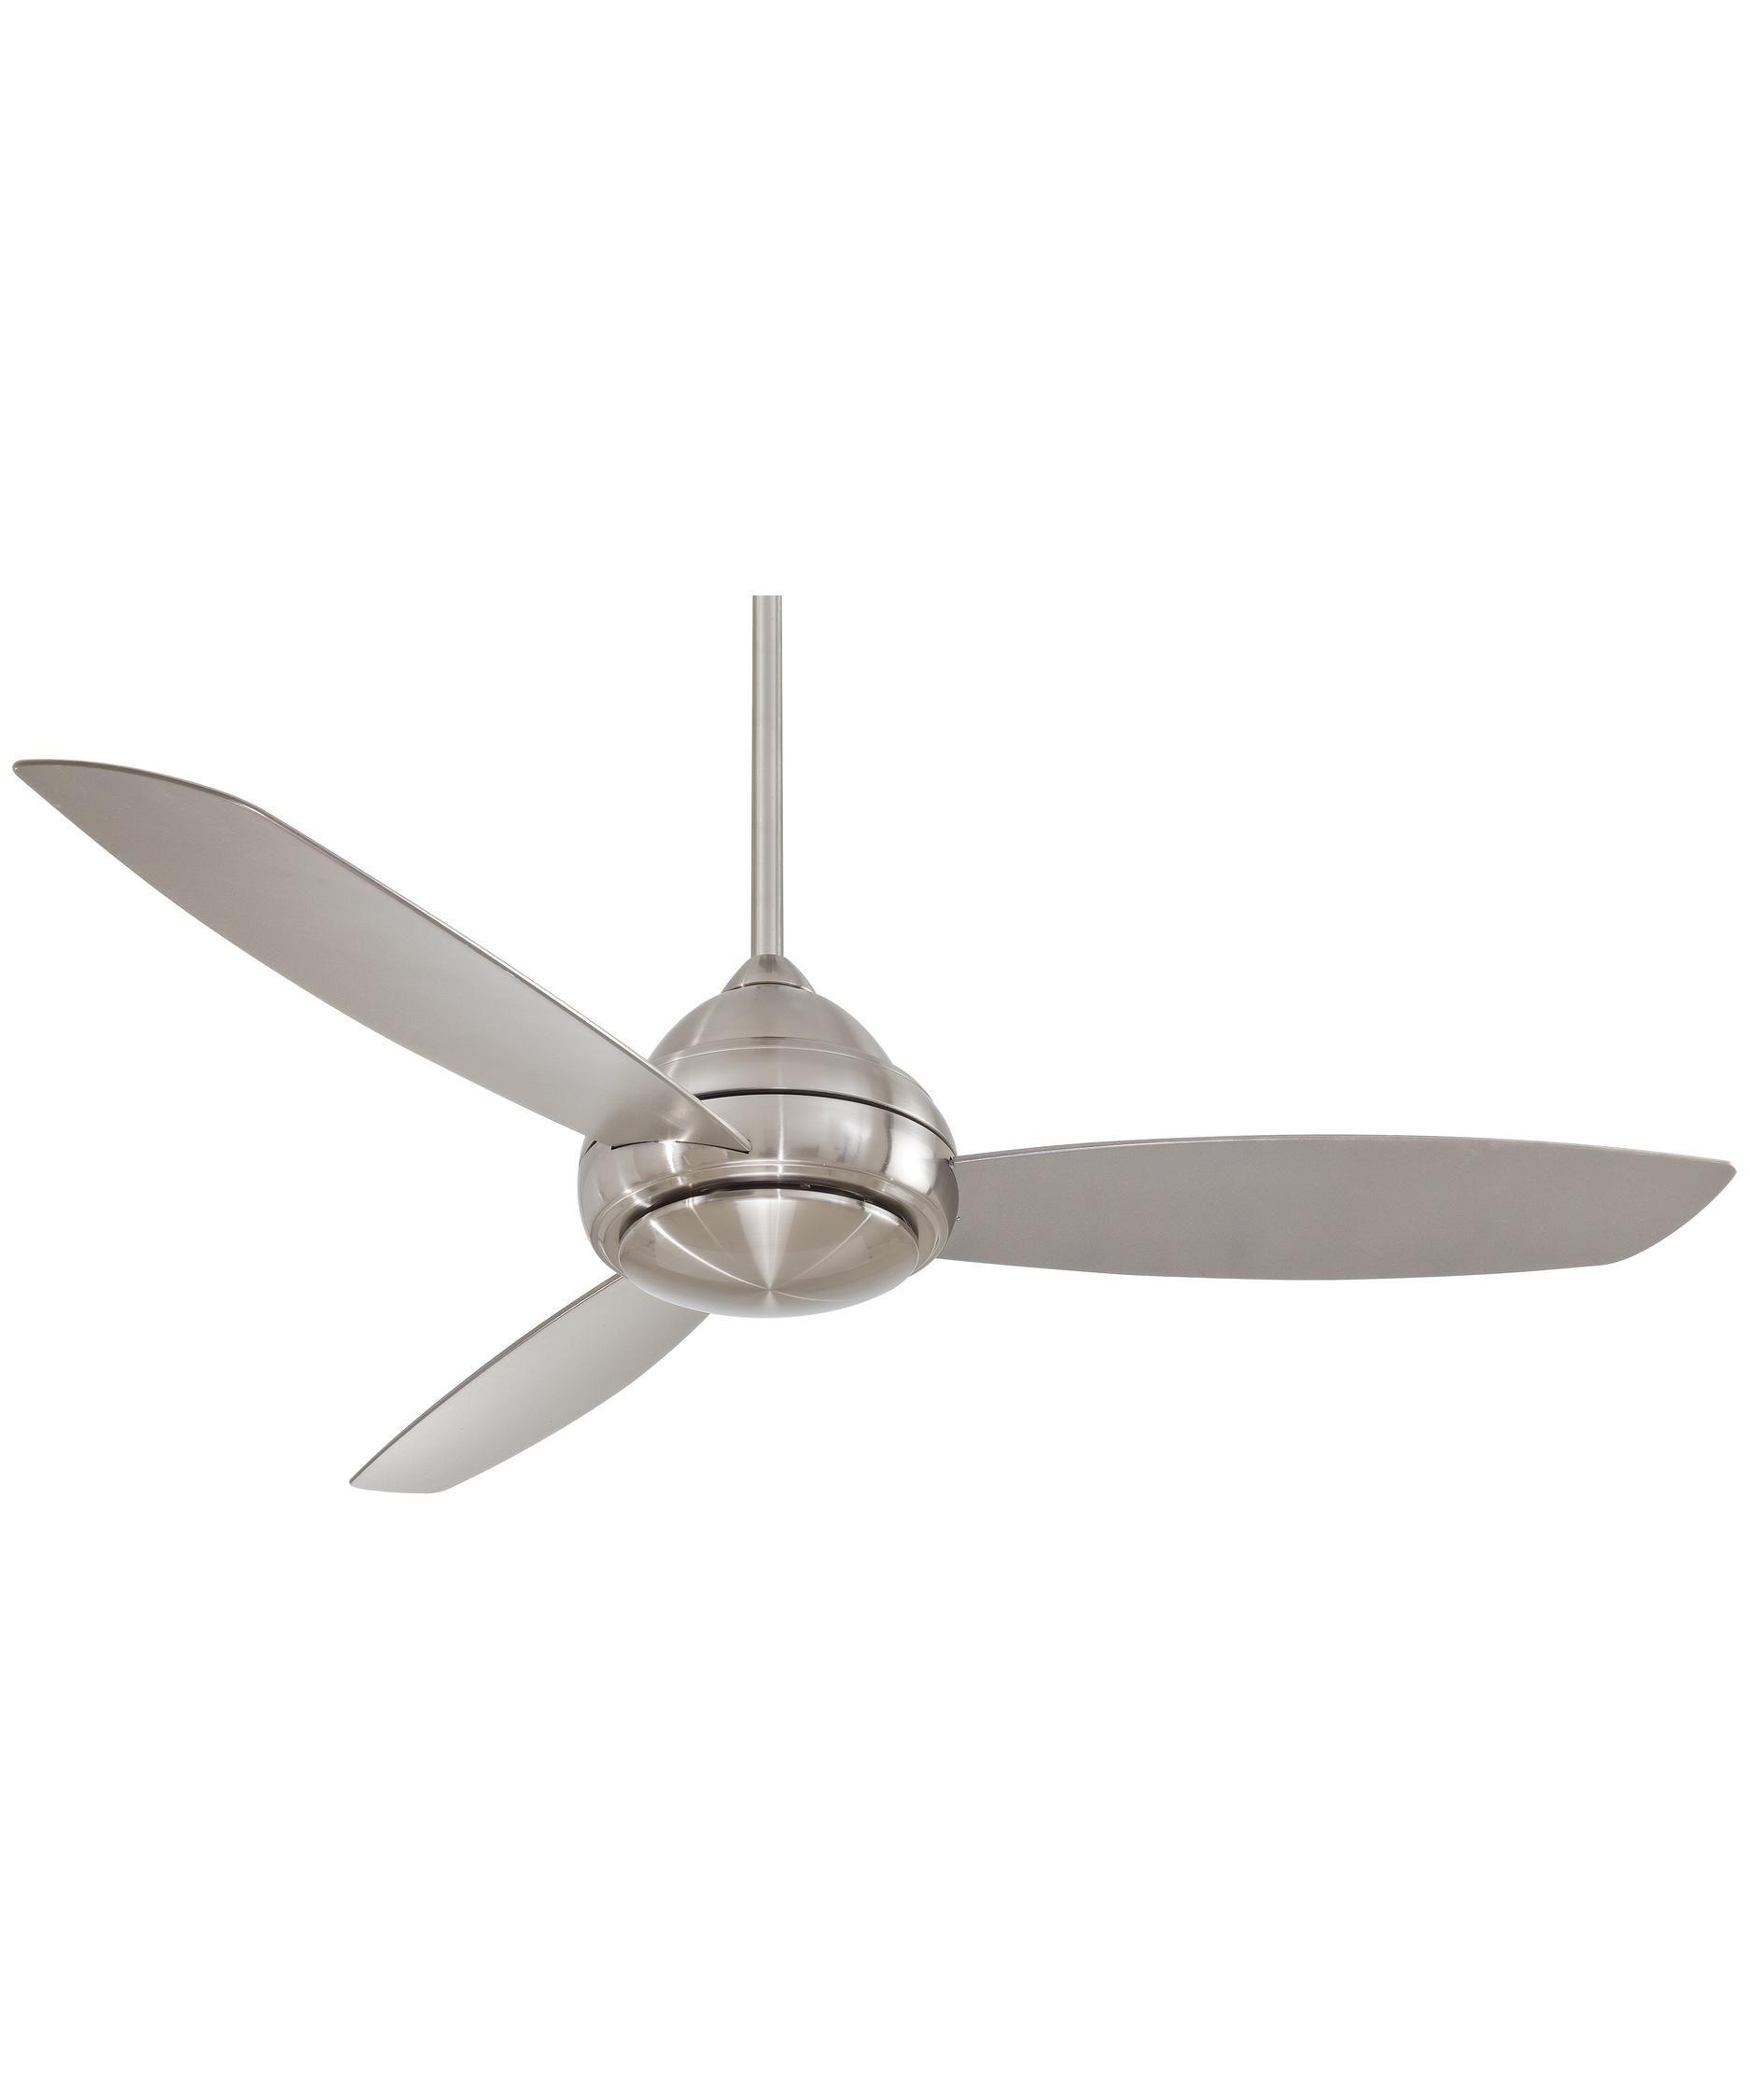 Concept 1 Light Ceiling Fan in Brushed Nickel Wet